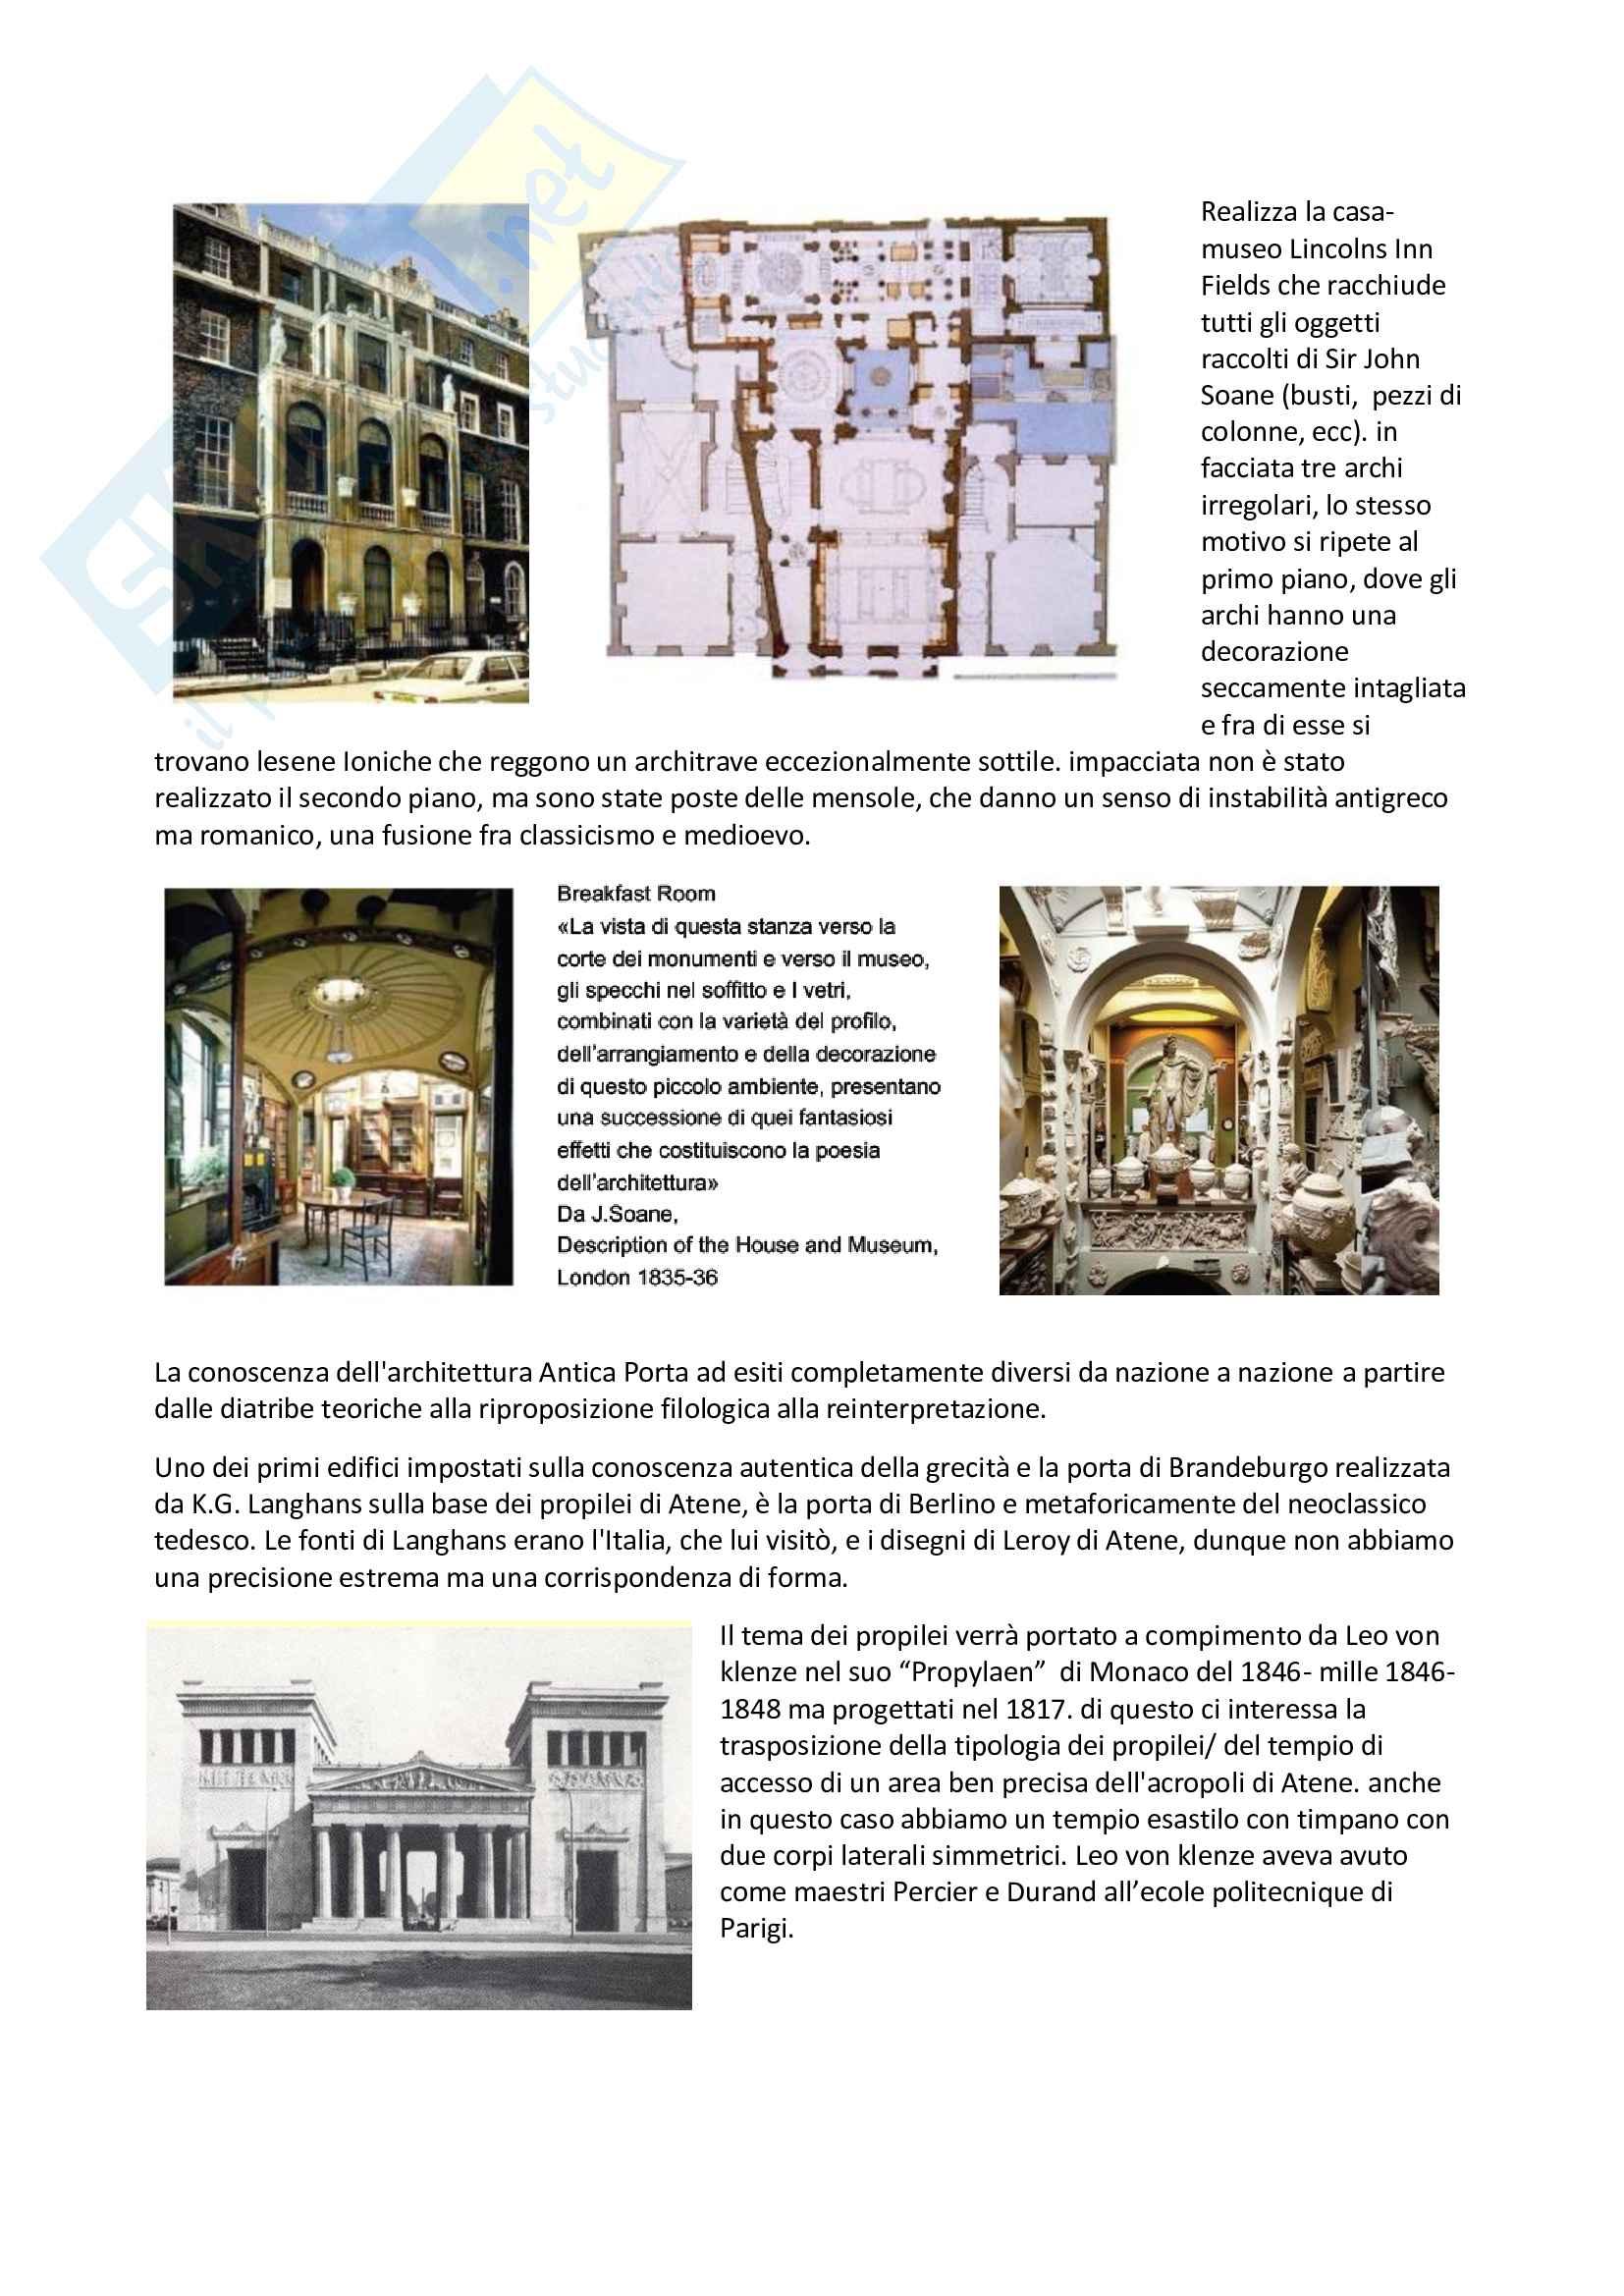 Storia dell'architettura 2, Iacobone, Lezioni Pag. 16